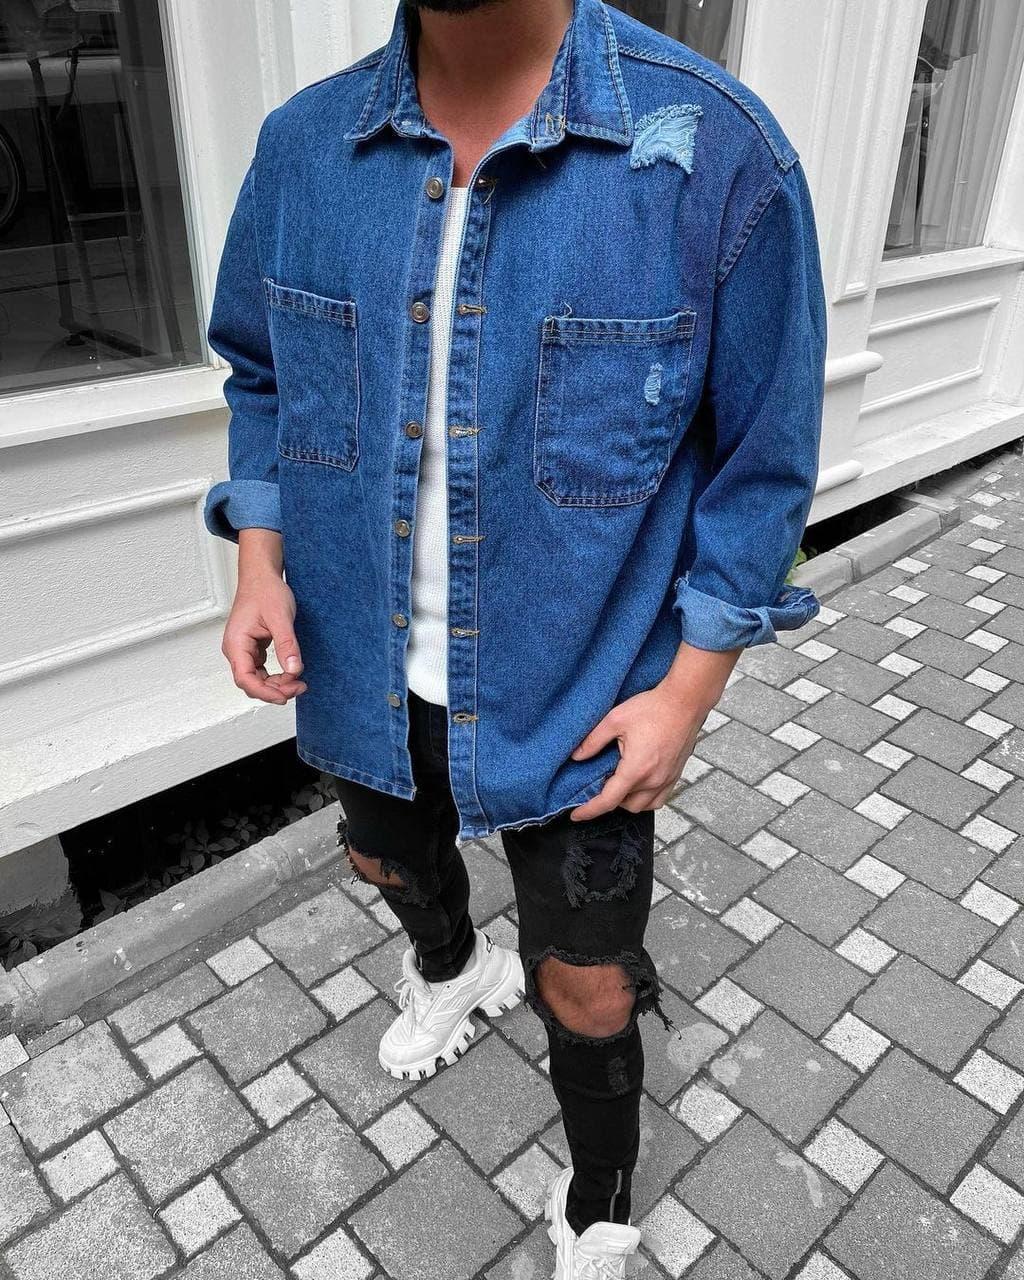 😜Рубашка - мужская джинсовая байковая / чоловіча джинсова рубашка в синьому кольорі